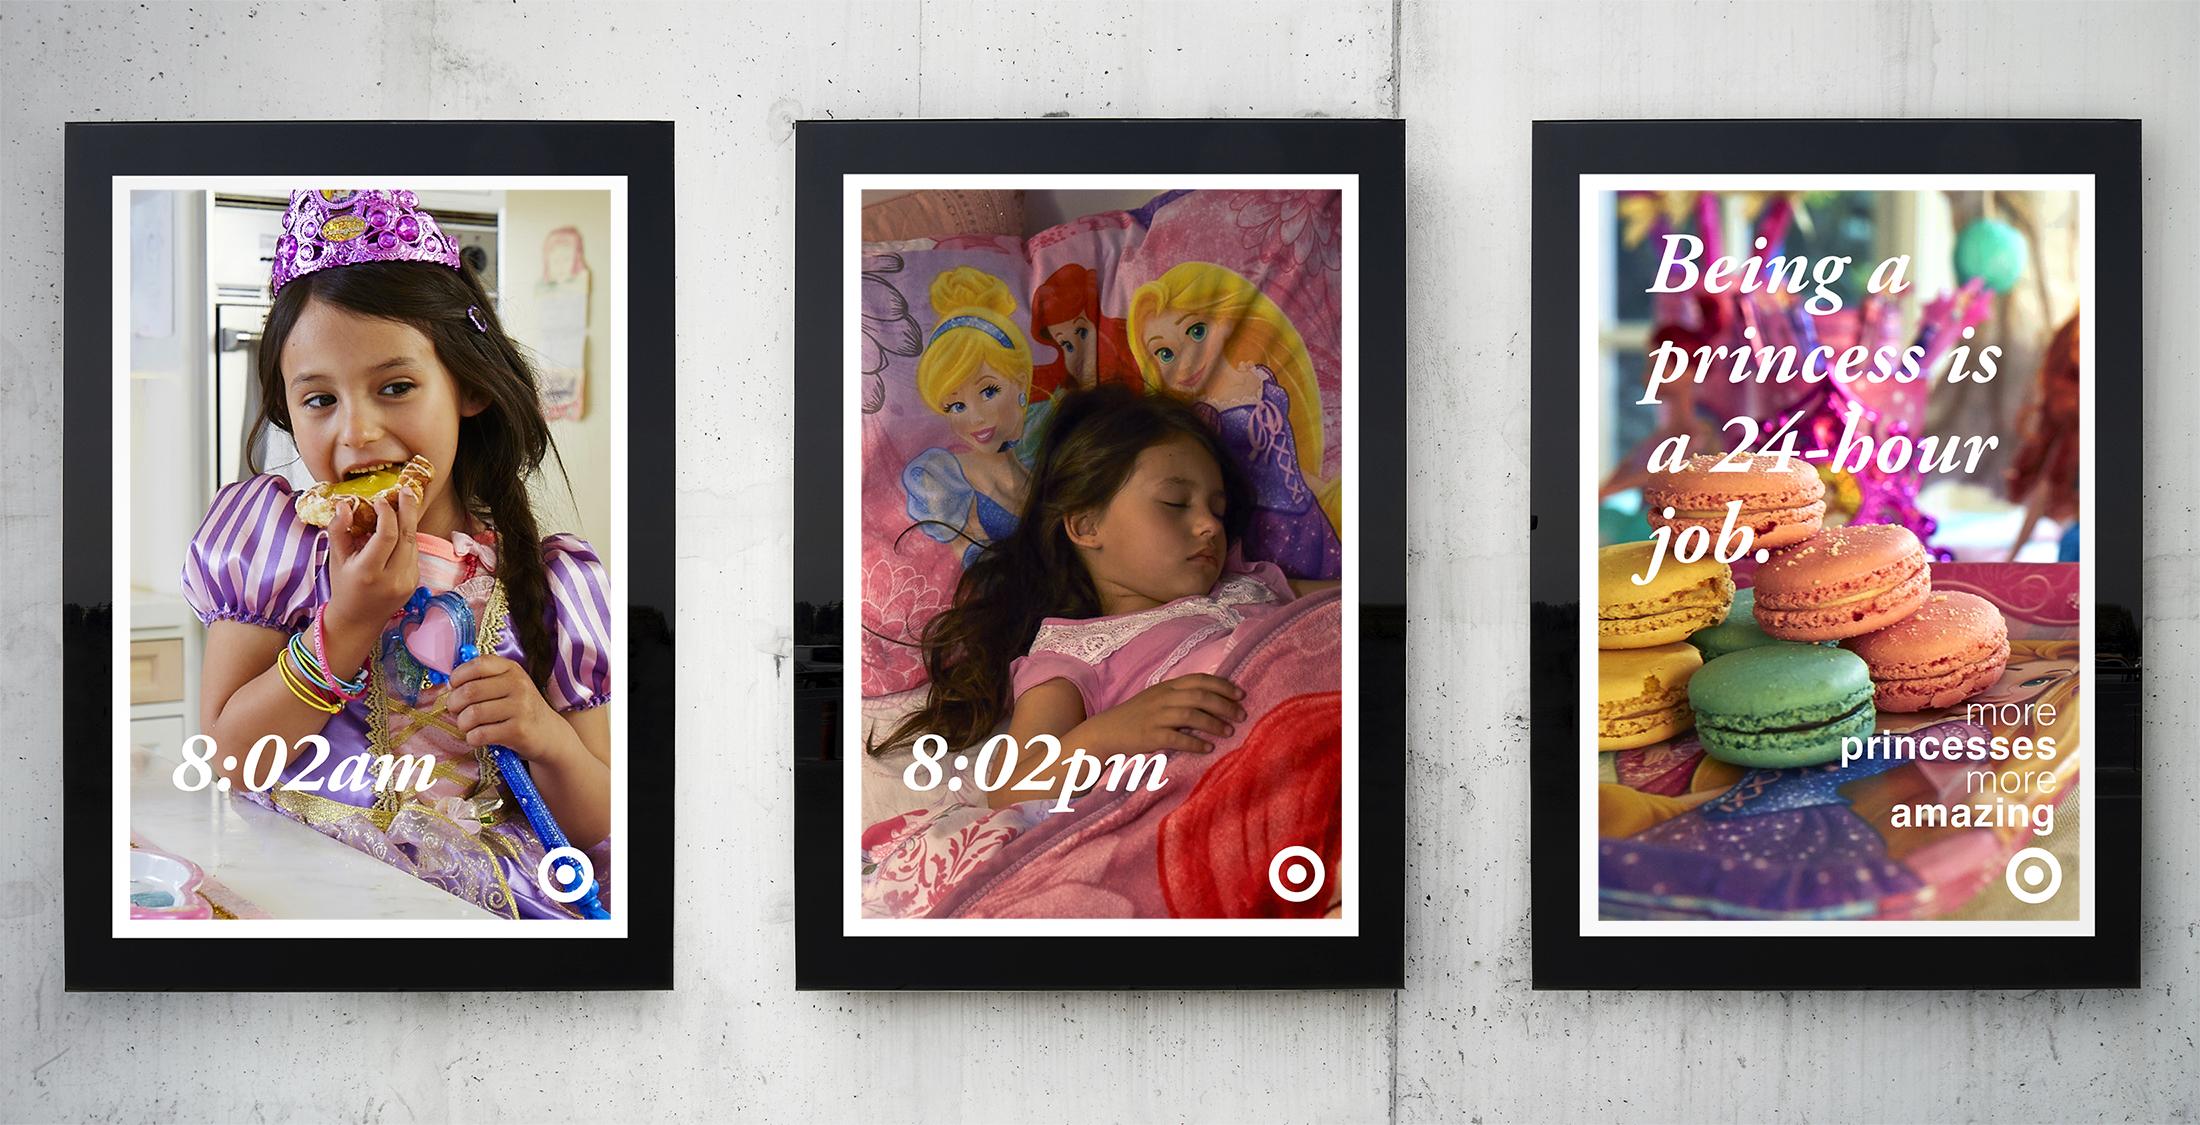 Posters_Princess.jpg